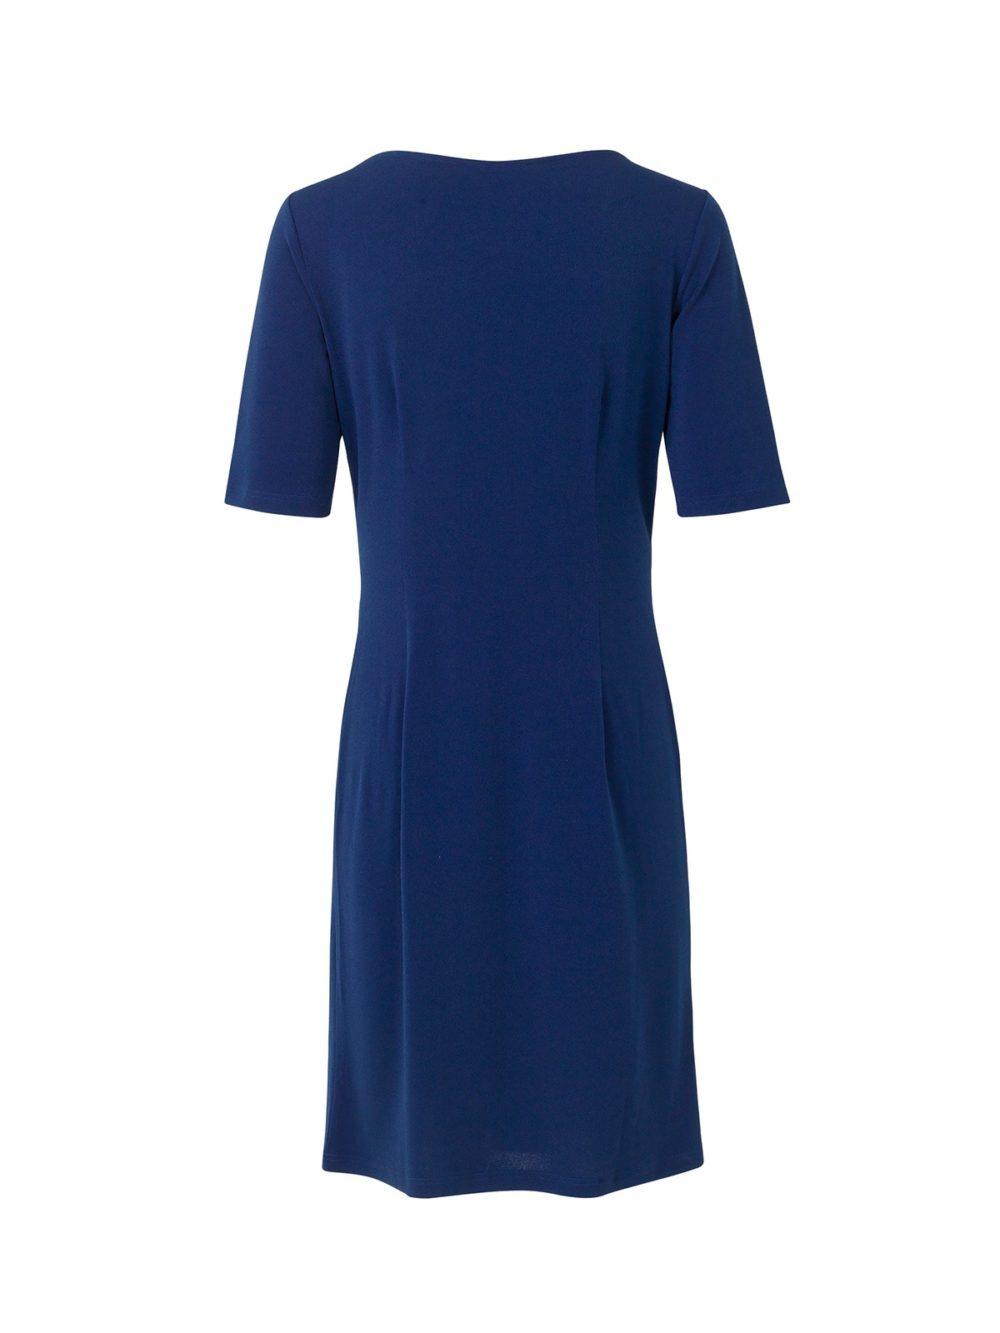 Volant177 Dress